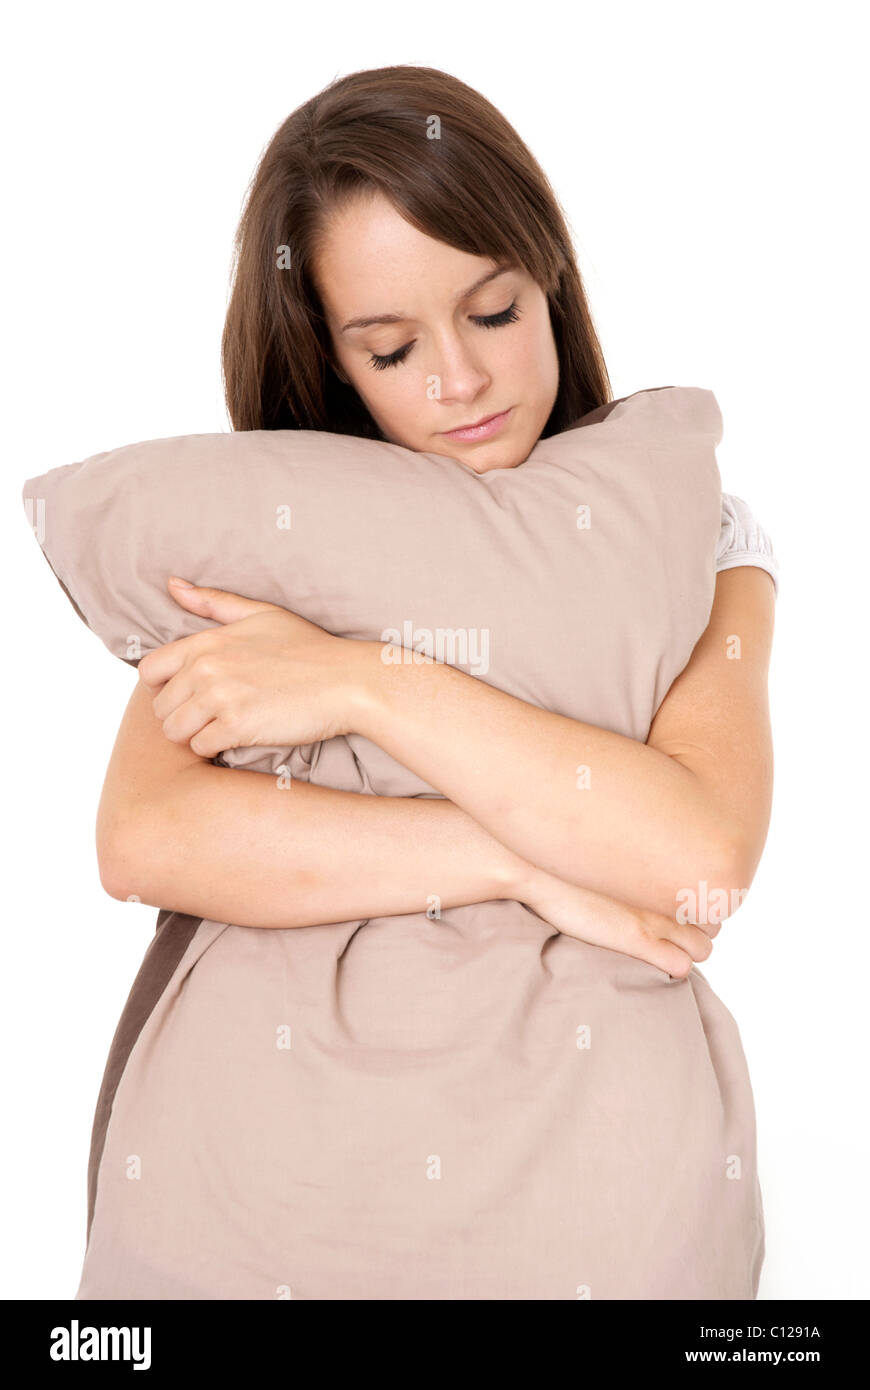 https www alamy com stock photo girl hugging pillow isolated on white 35086390 html